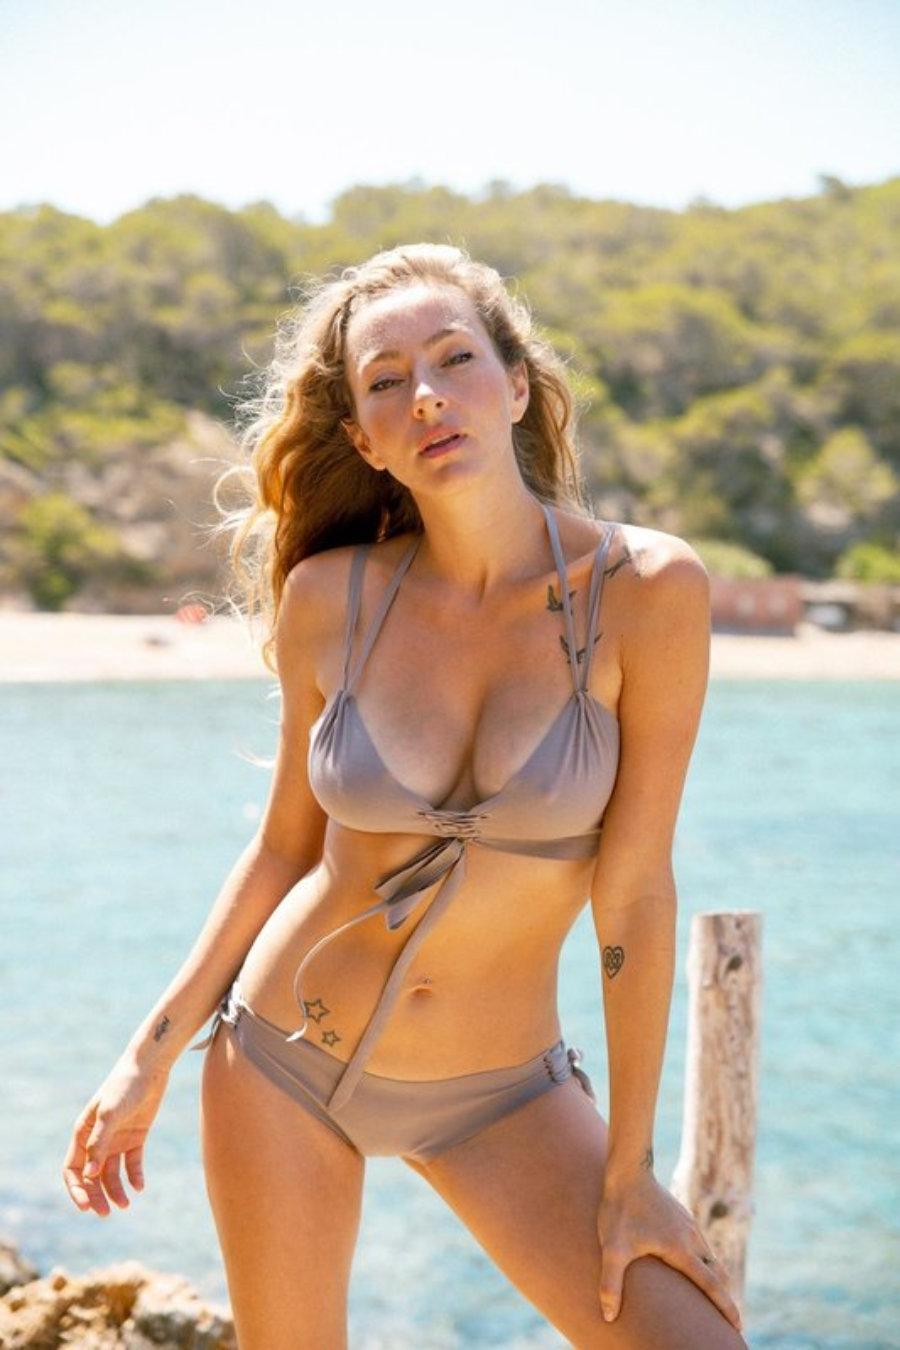 Hawaii top/ slip colibri seamless and handmade bikini